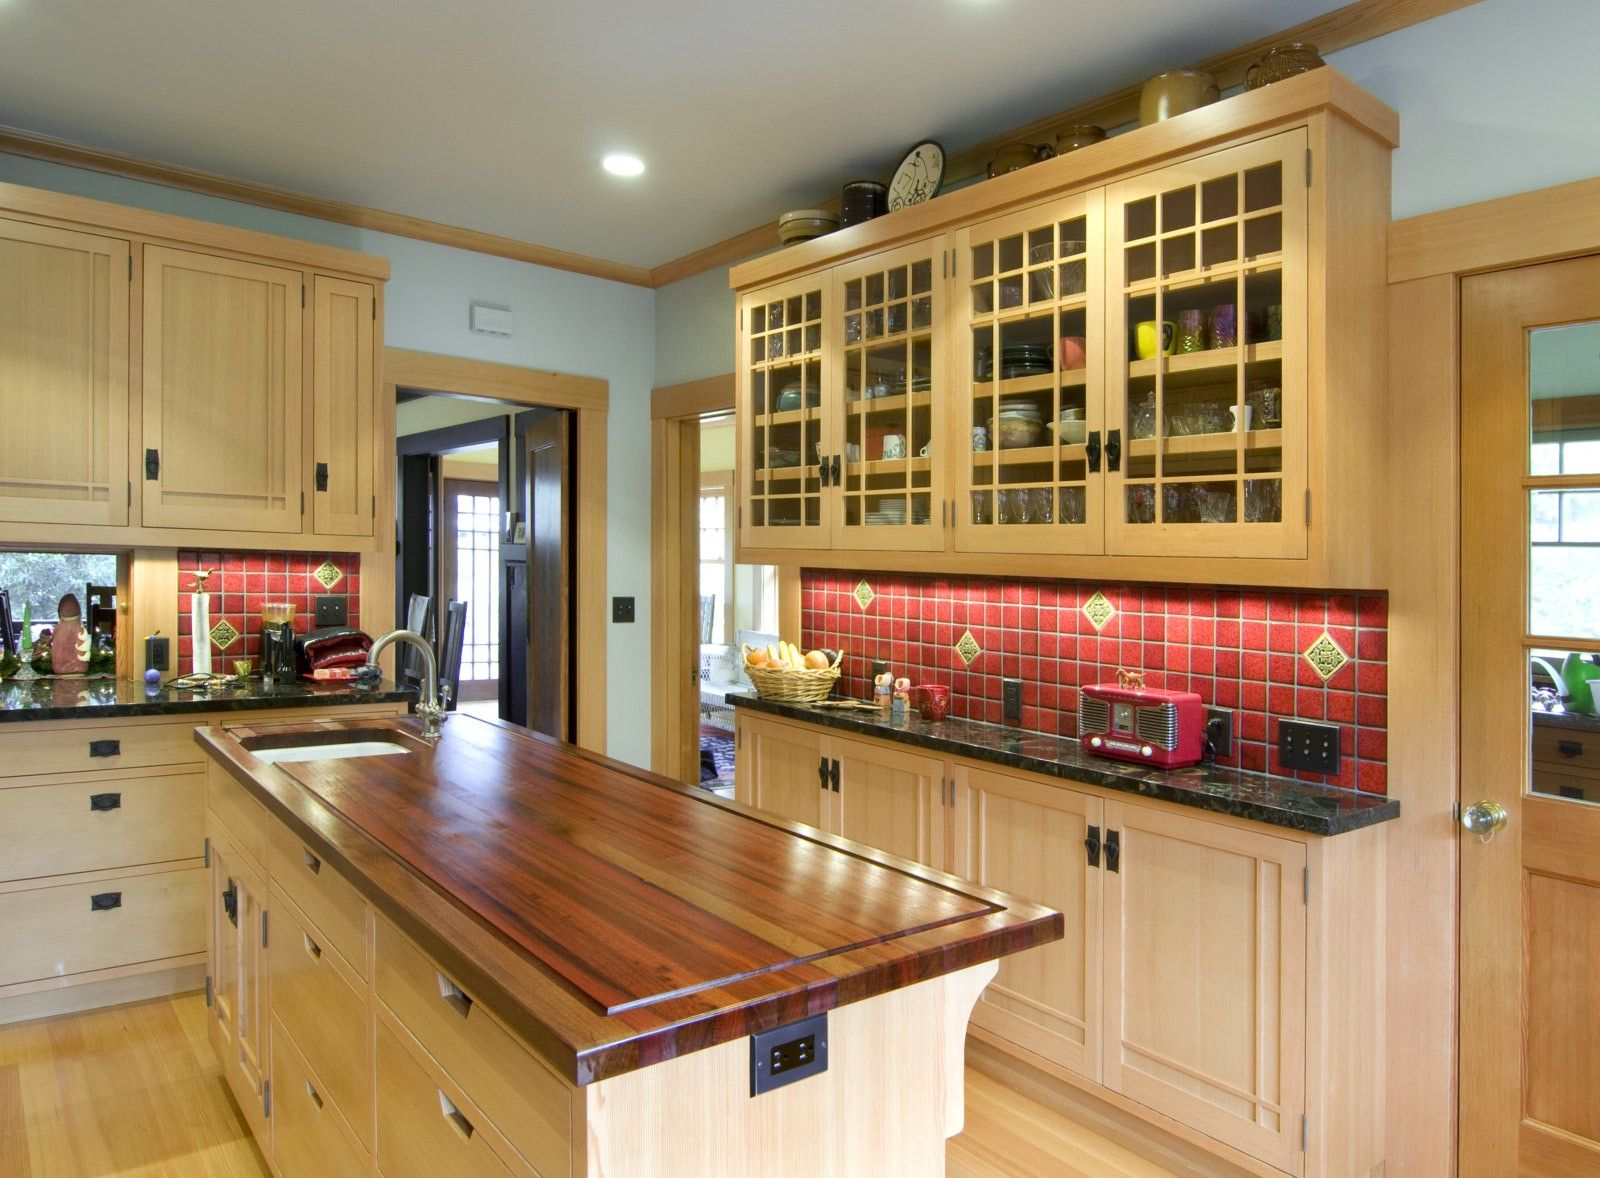 99 Arts And Crafts Kitchen Cabinet Hardware Kitchen Island Countertop Ideas Mission Style Kitchen Cabinets Craftsman Kitchen Cabinets Kitchen Craft Cabinets